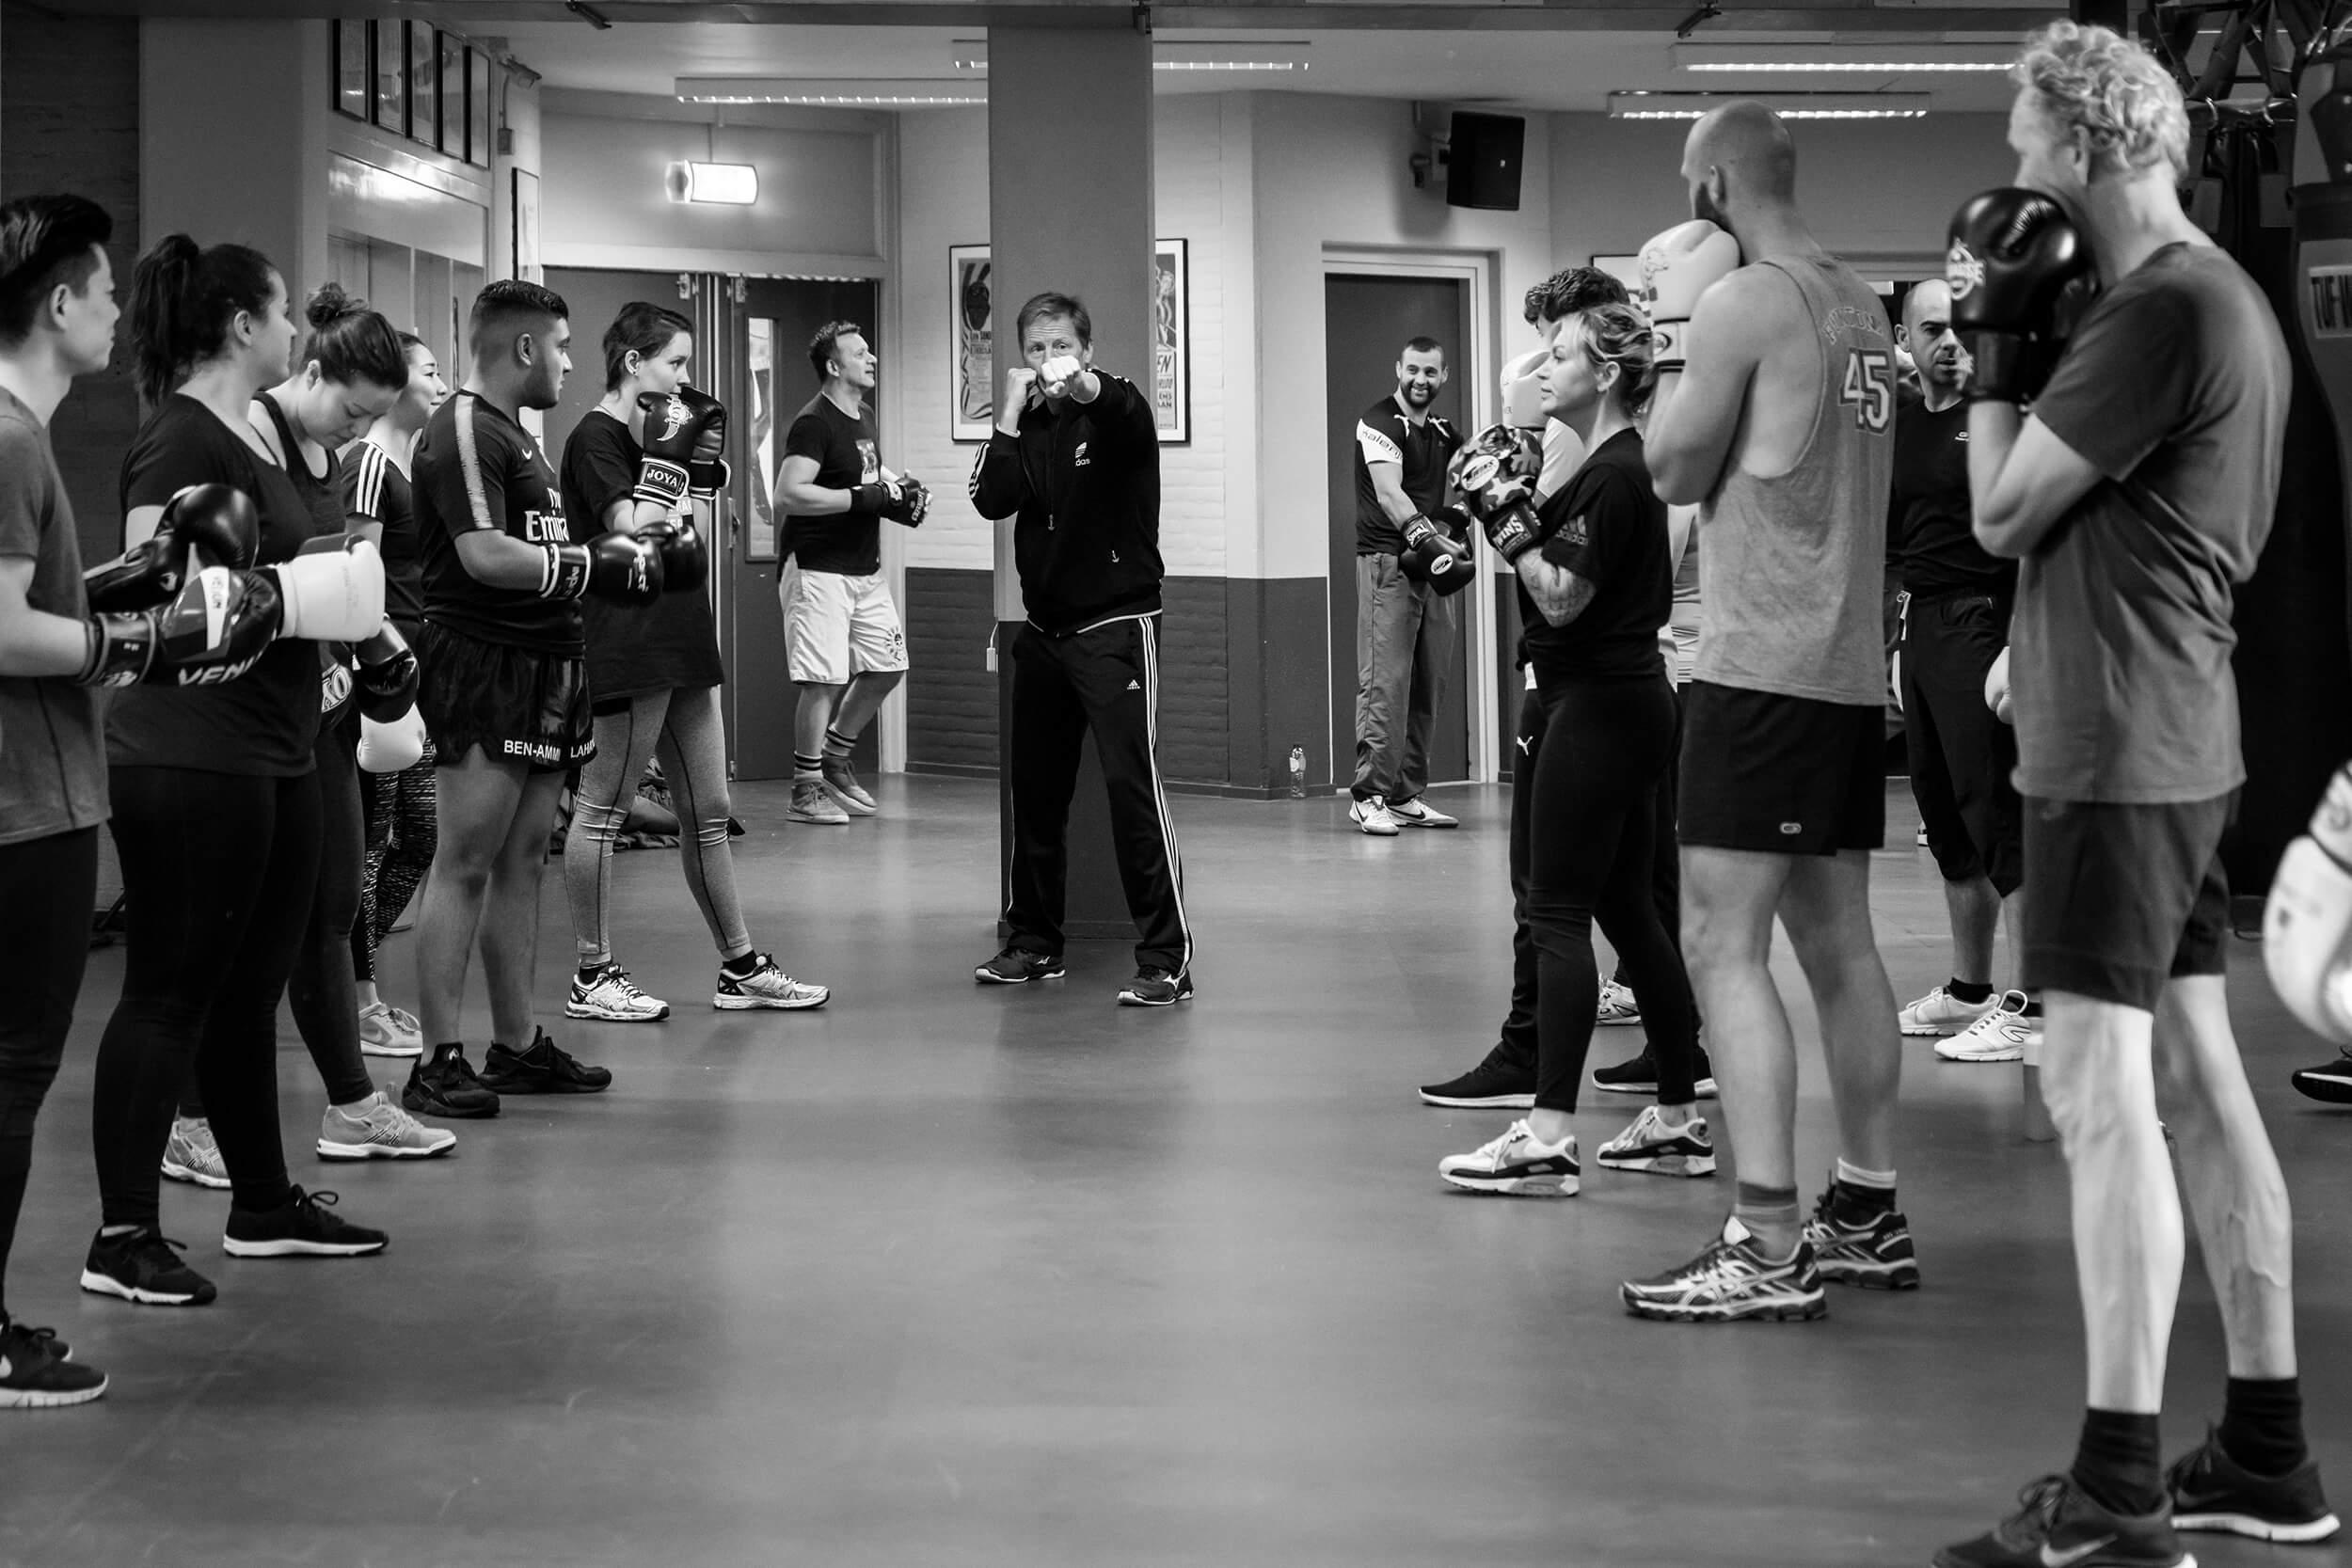 Bokstraining-beginners-warm-up-Introductieklas.jpg